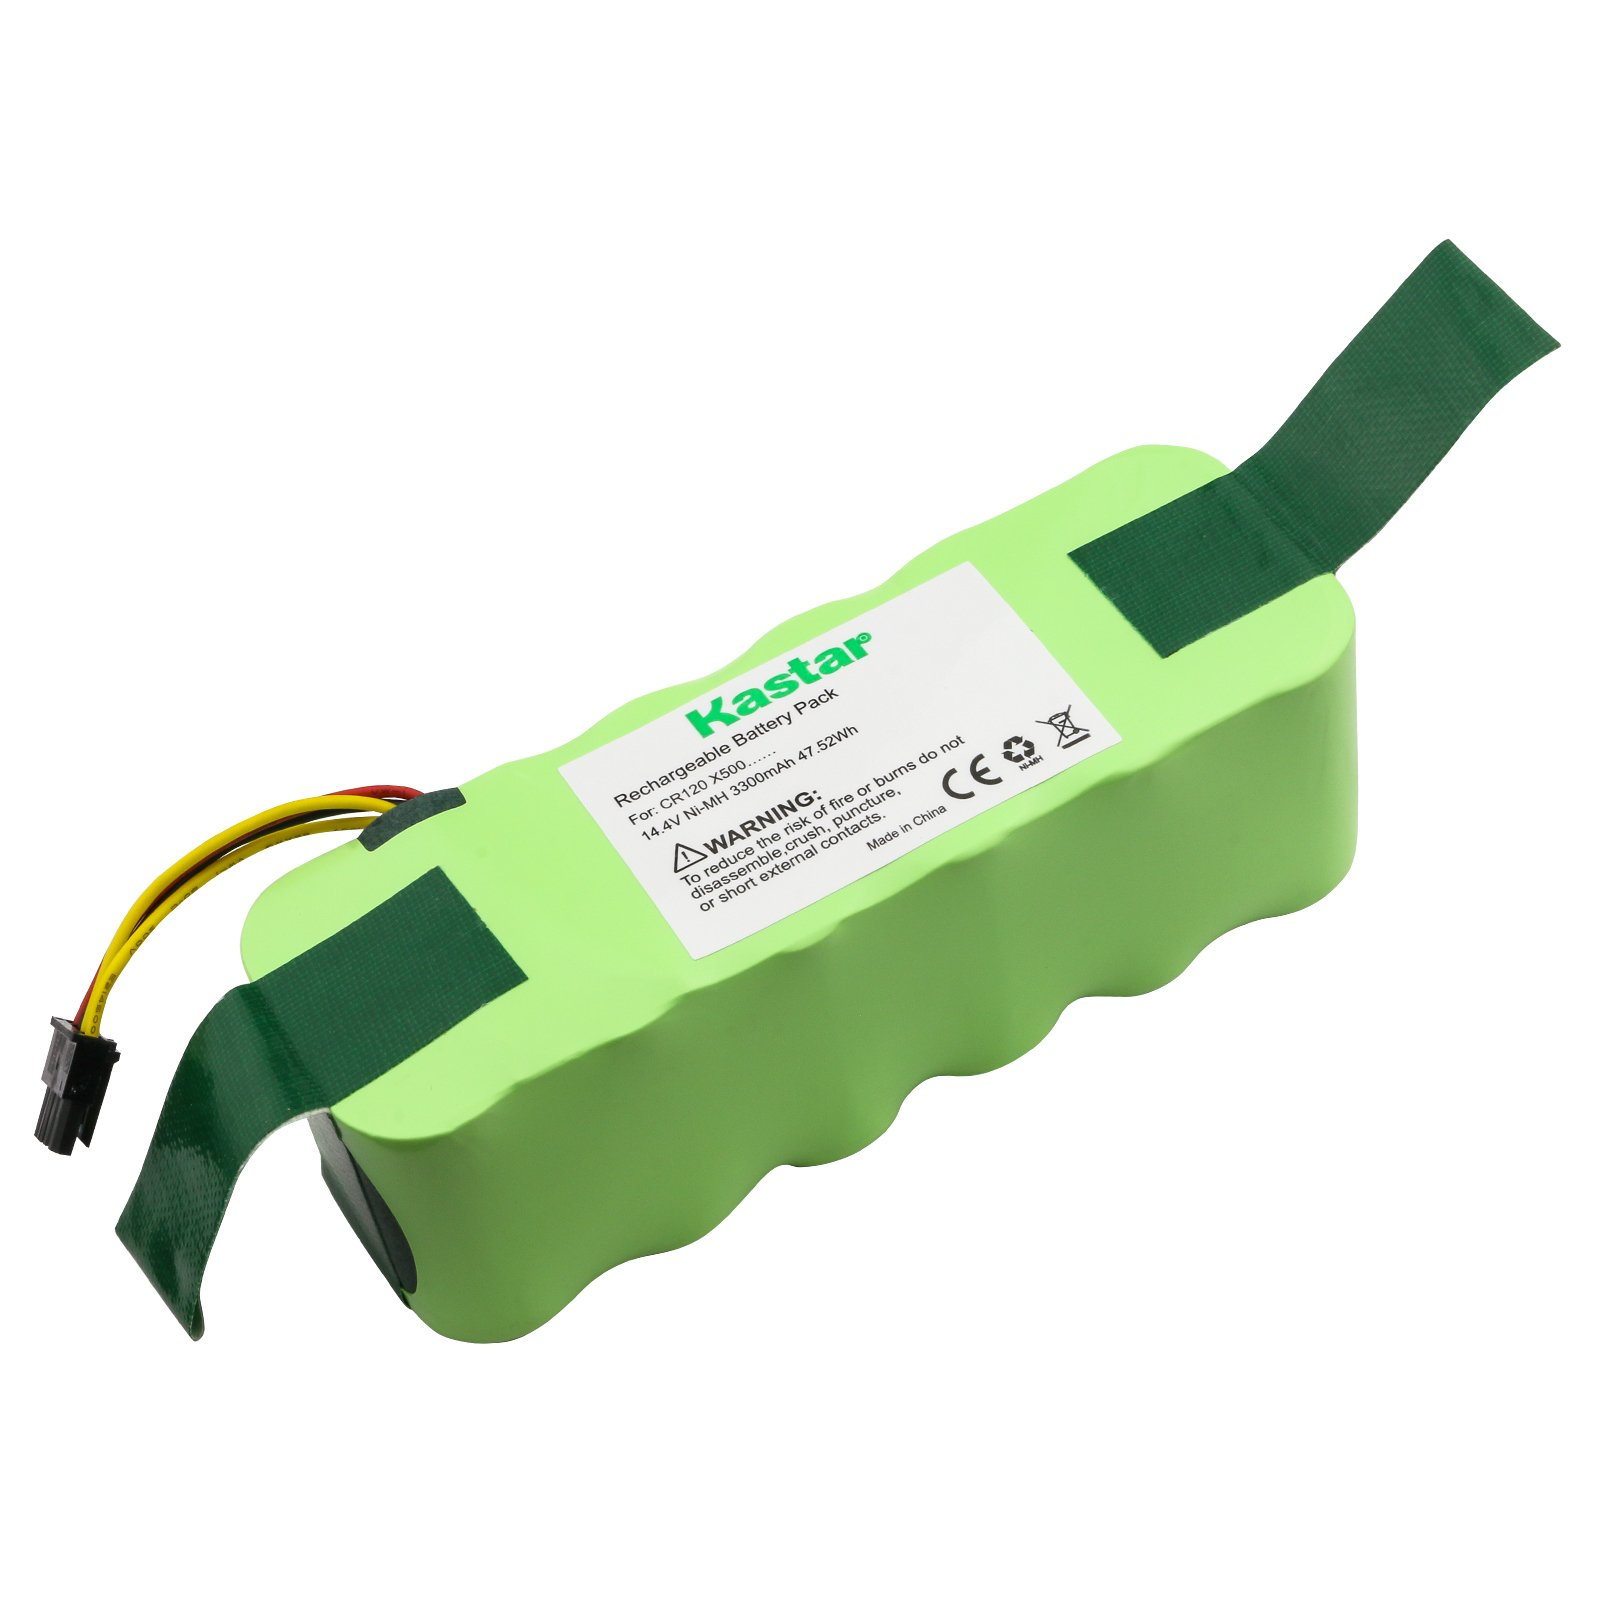 Kastar CR120 Battery (1 Pack), Ni-MH 14.4V 3300mAh, Replacement for Deebot CR120, KK-8, ECOVACS X500, LP43SC2000P